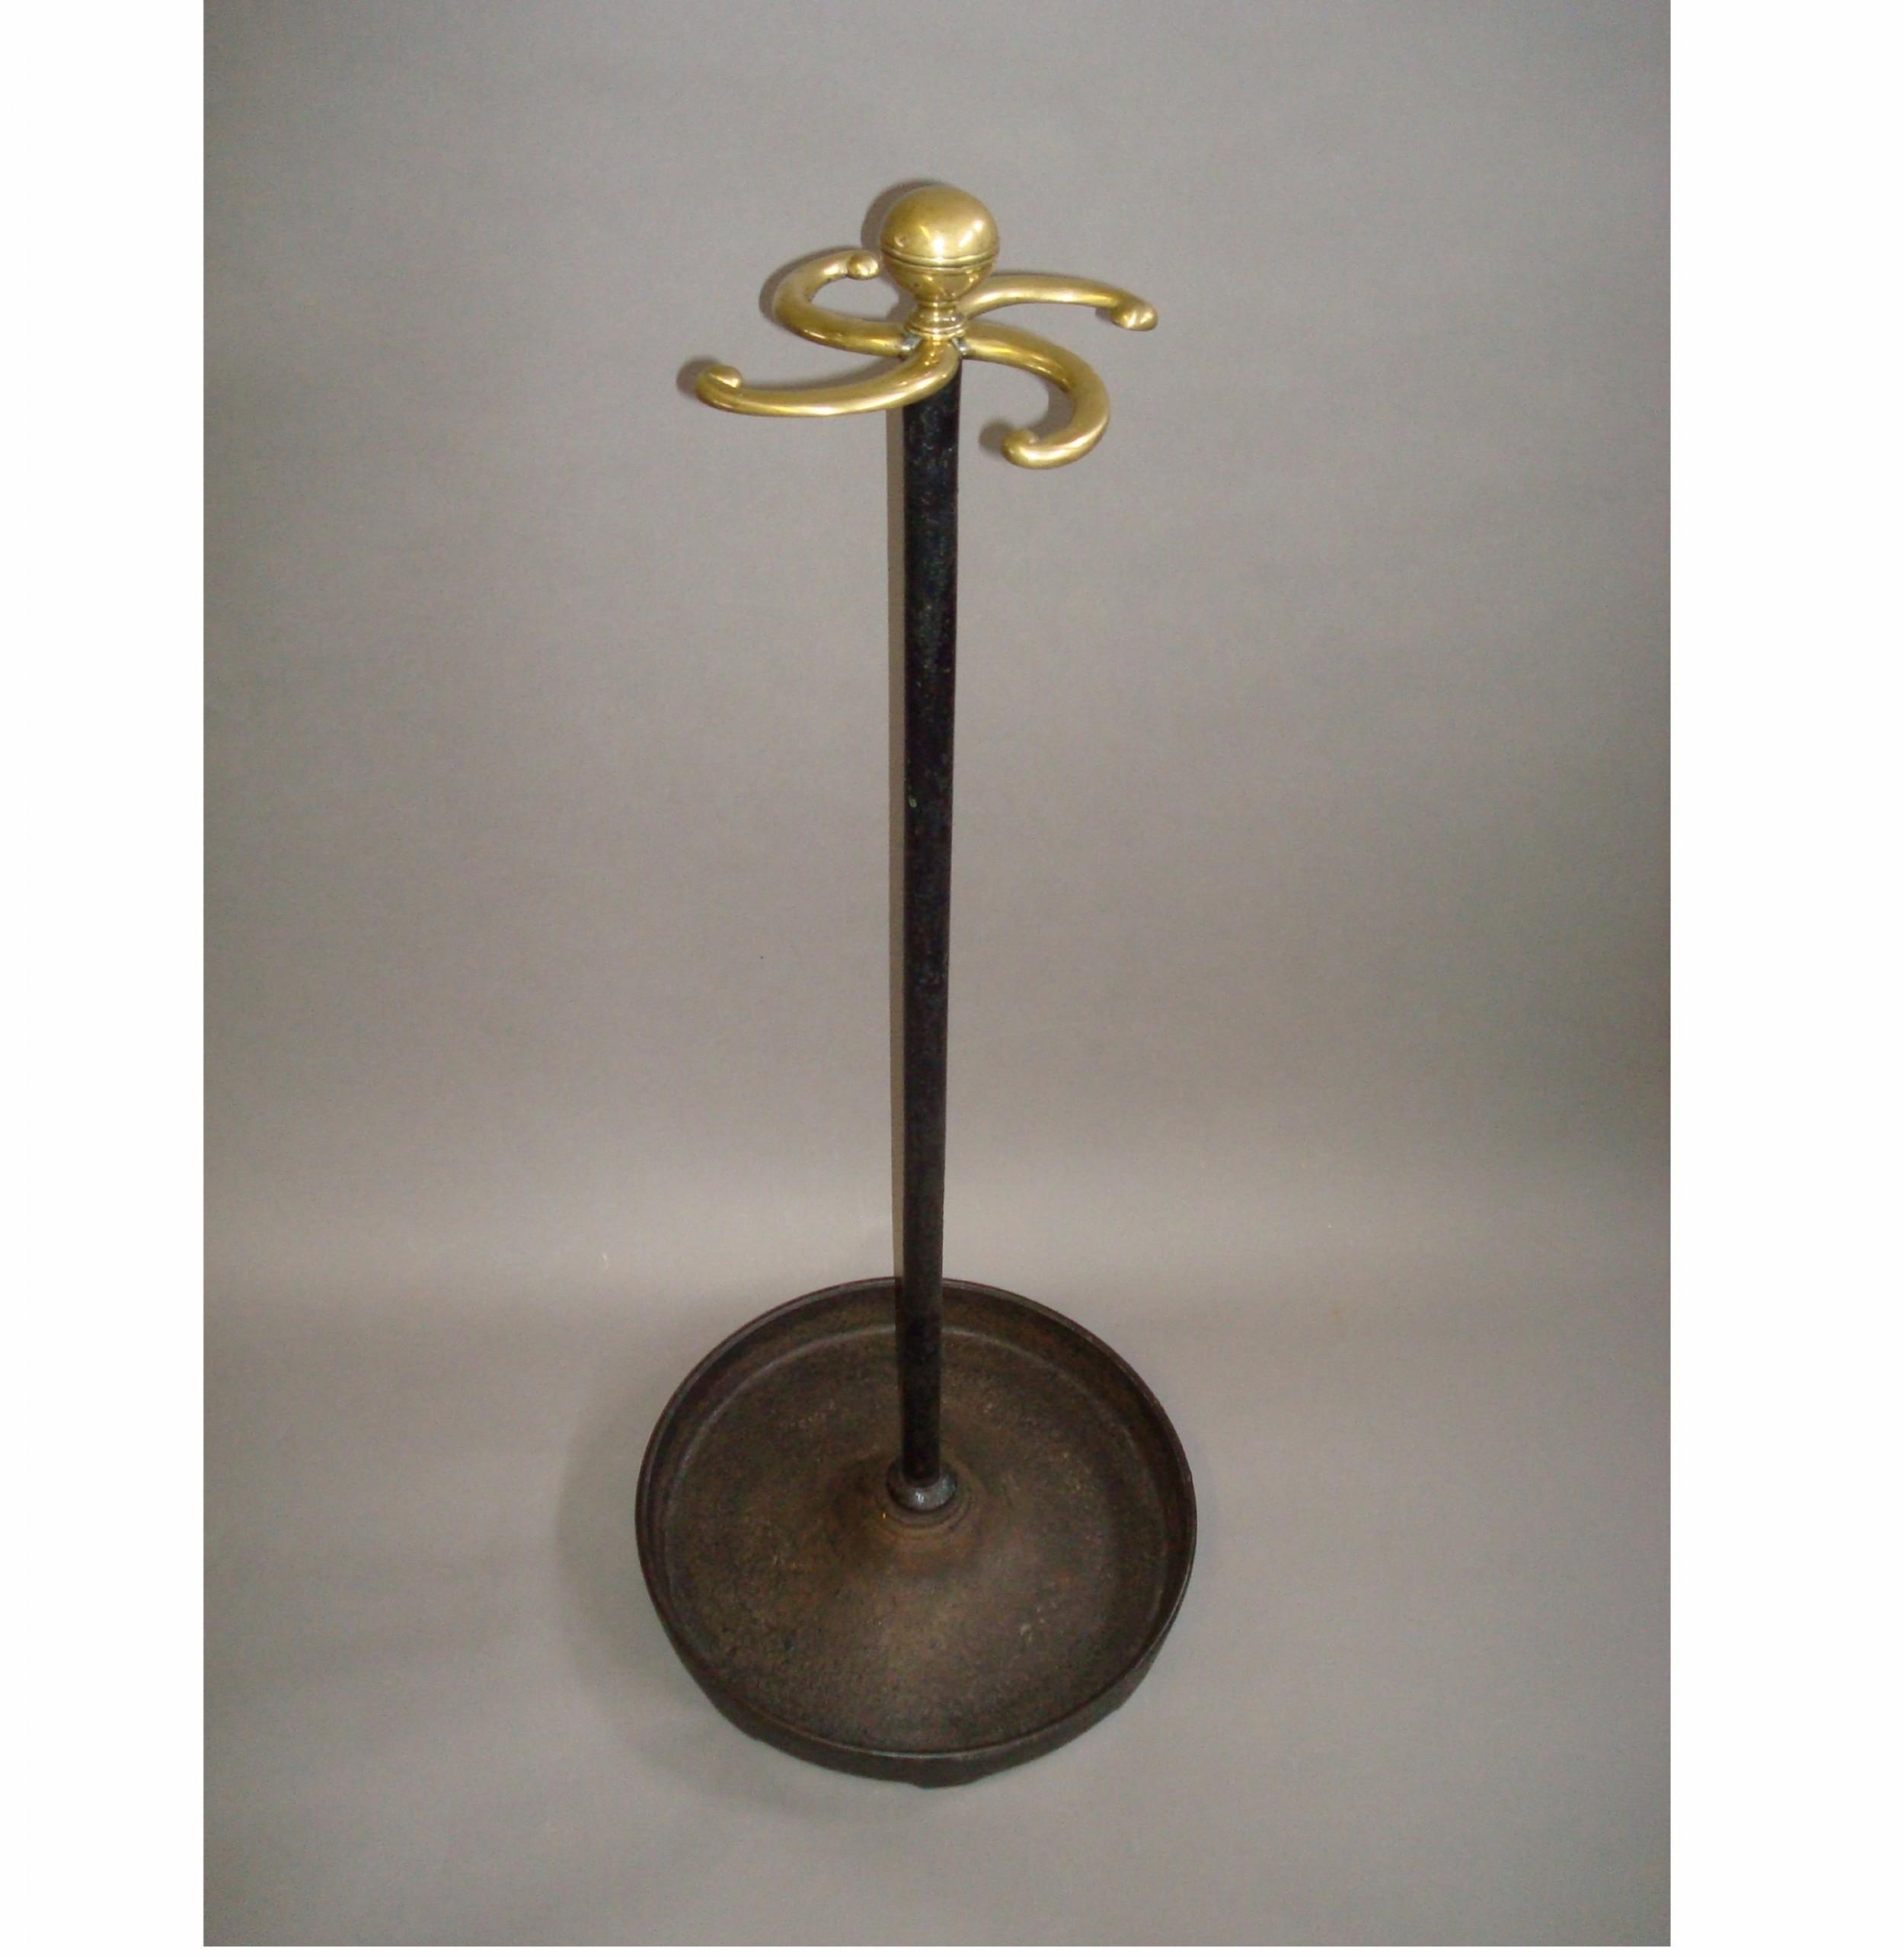 regency cast iron brass stick stand tall proportions